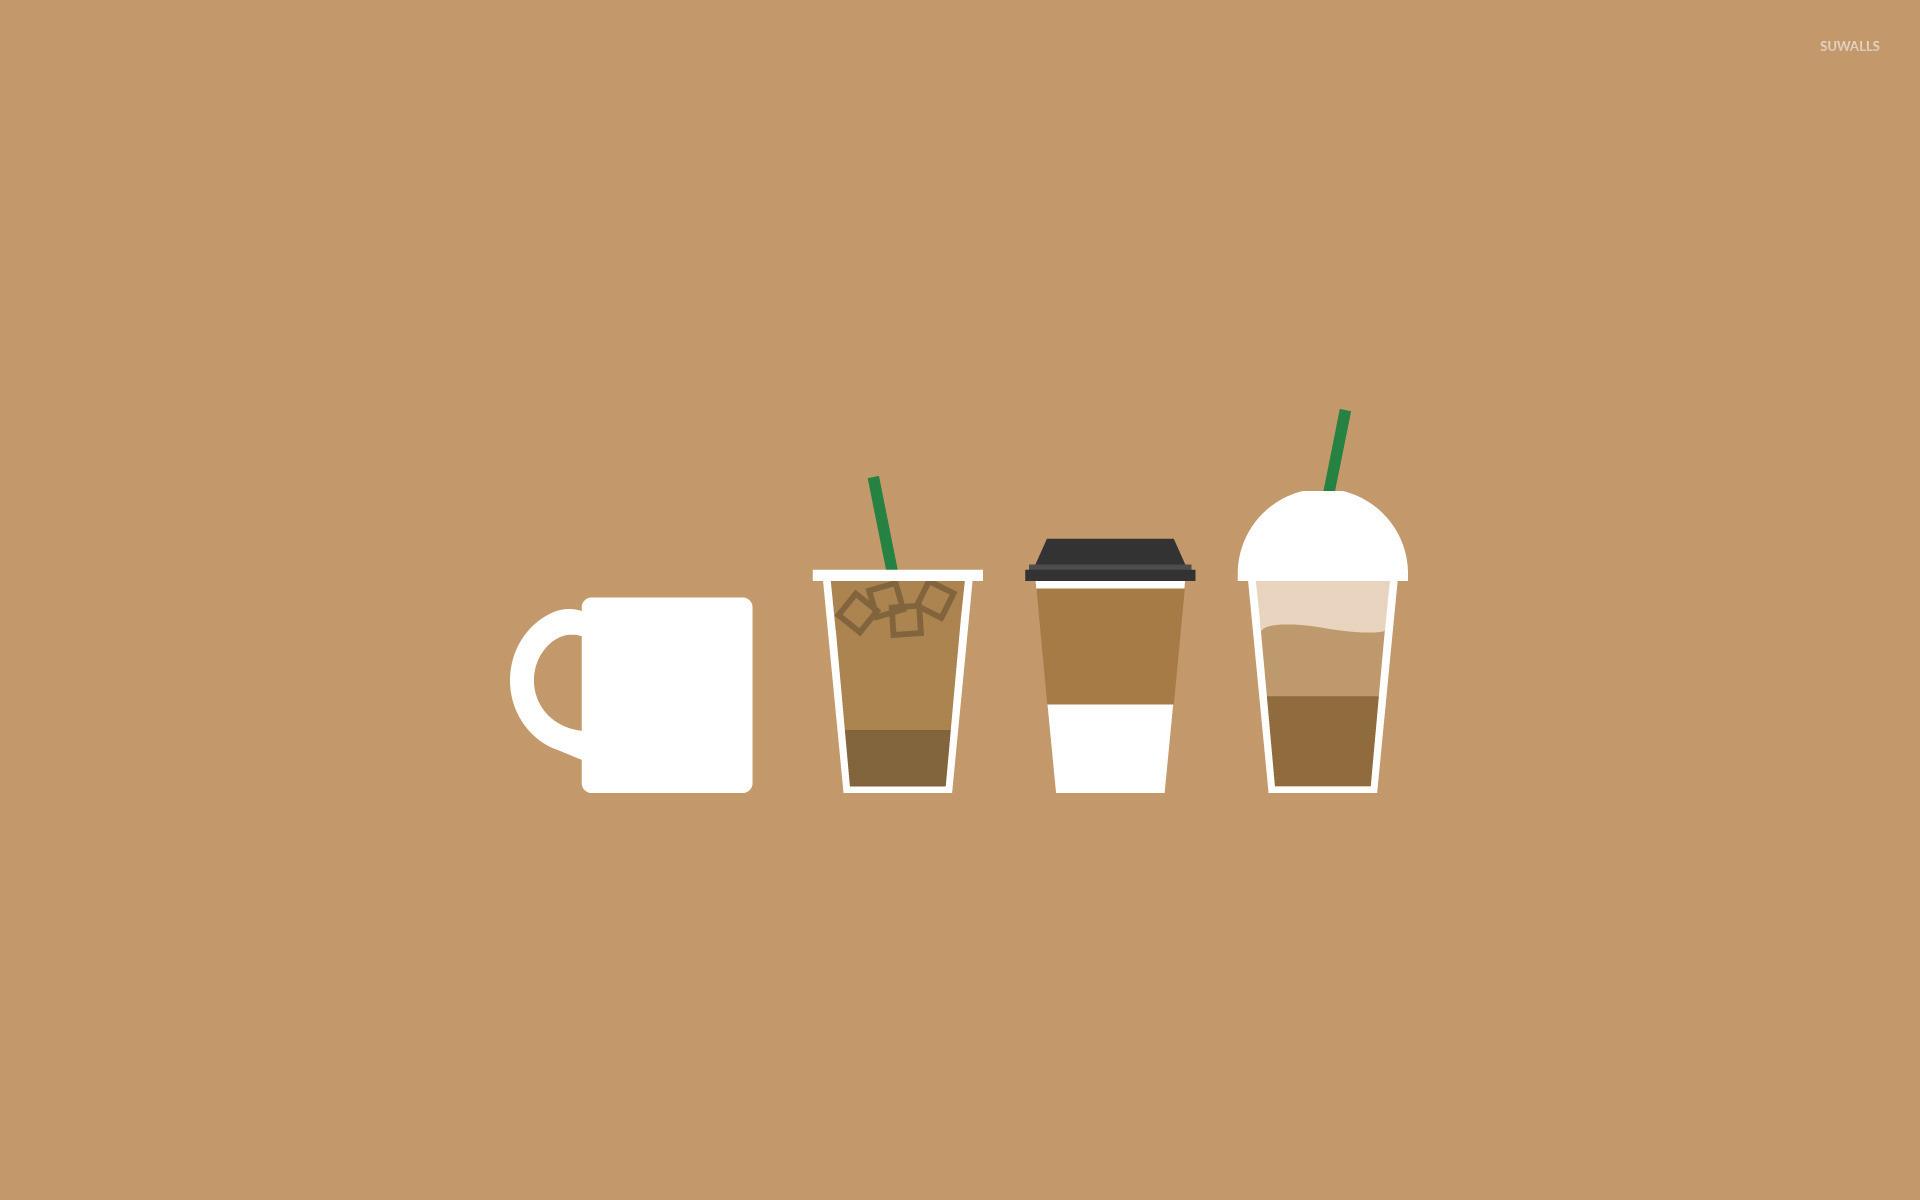 different-coffee-types-23934-1920x1200.j